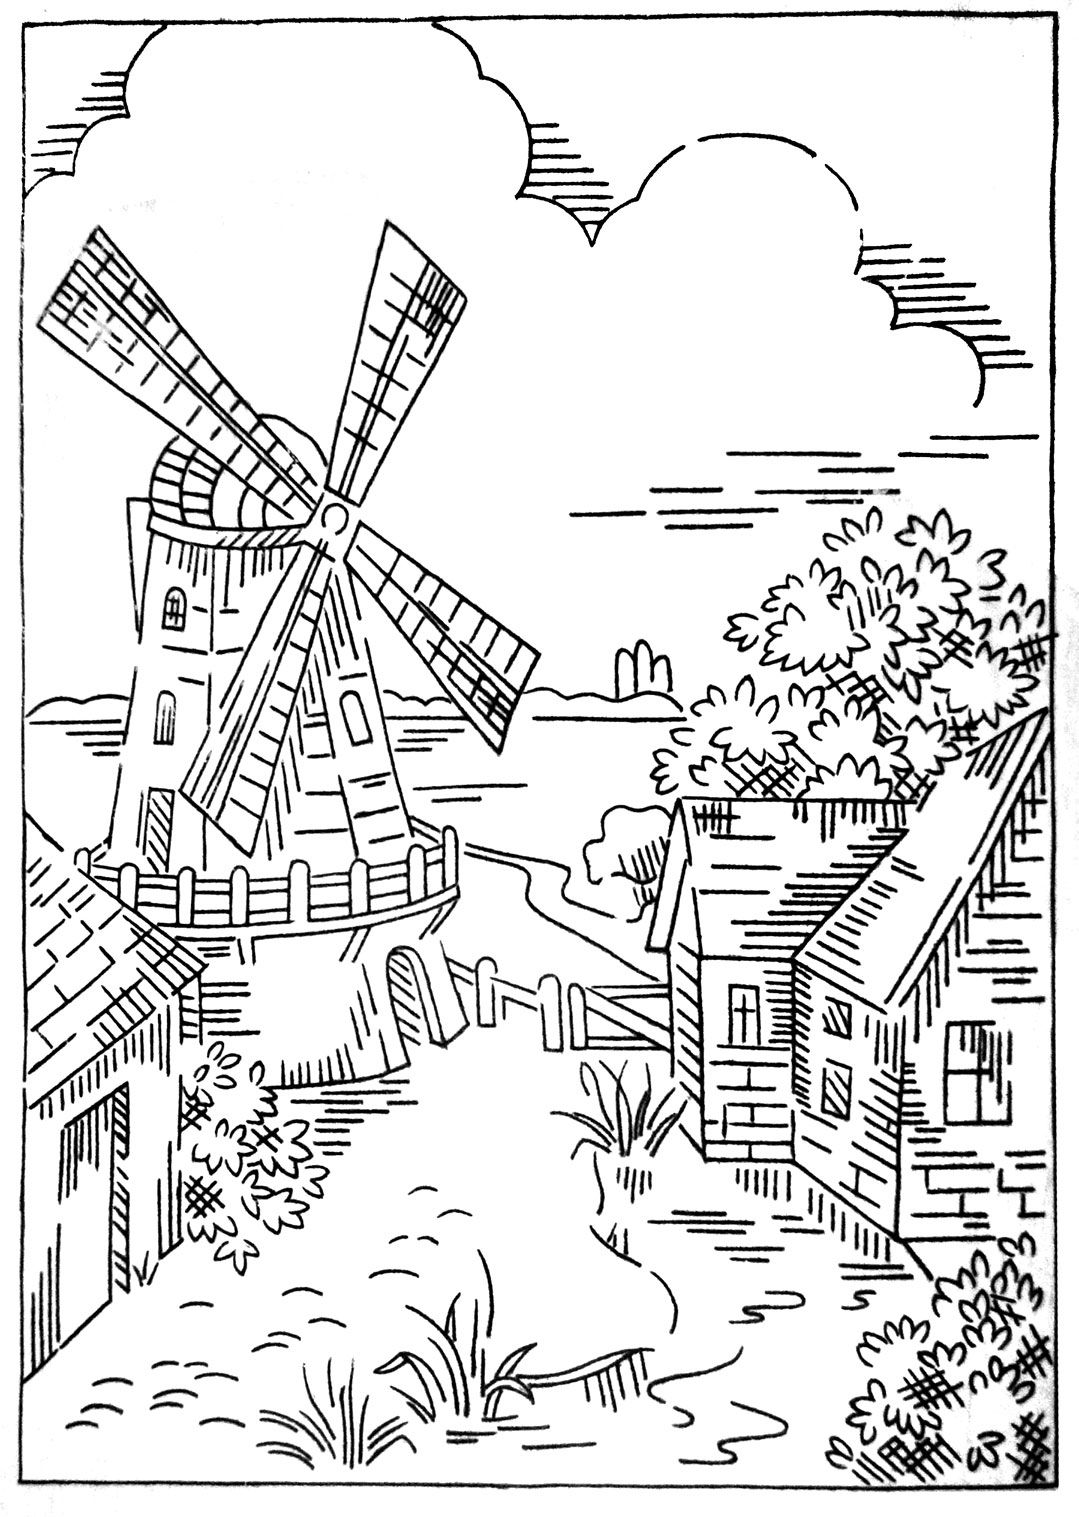 Briggs Windmill Transfer Jpg 1 079 1 517 Pixels Coloring Mood